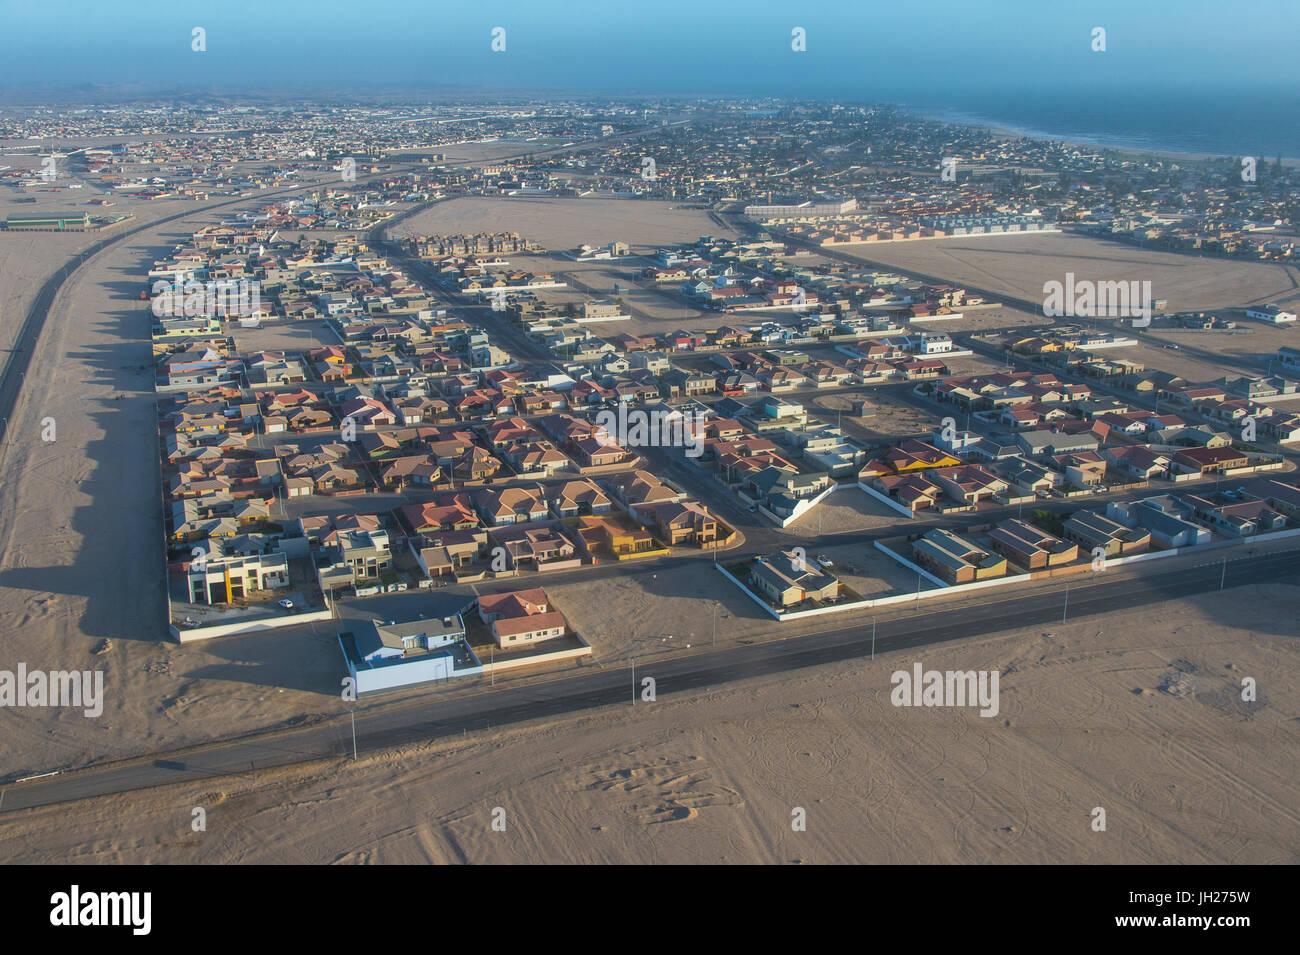 Aerial of Swakopmund, Namibia, Africa - Stock Image